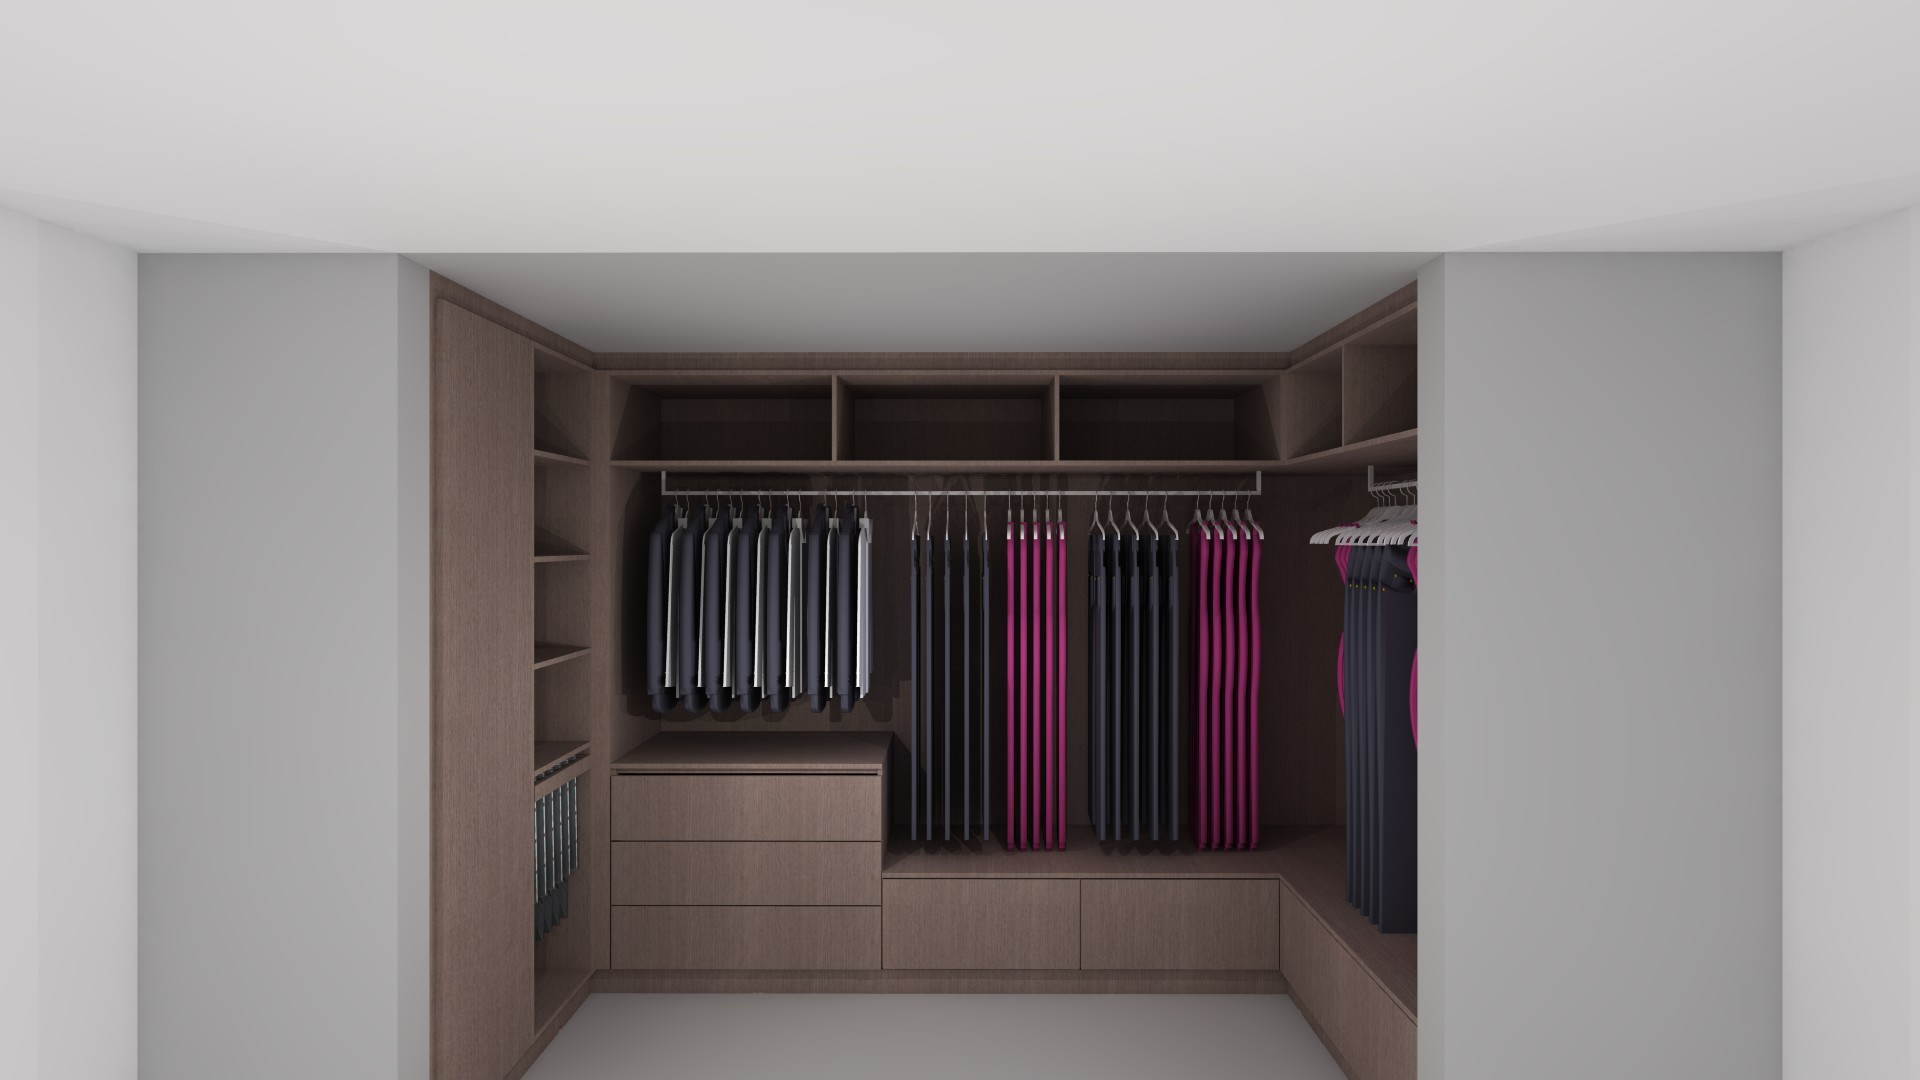 interieurarchitectuur nieuwbouw dressing